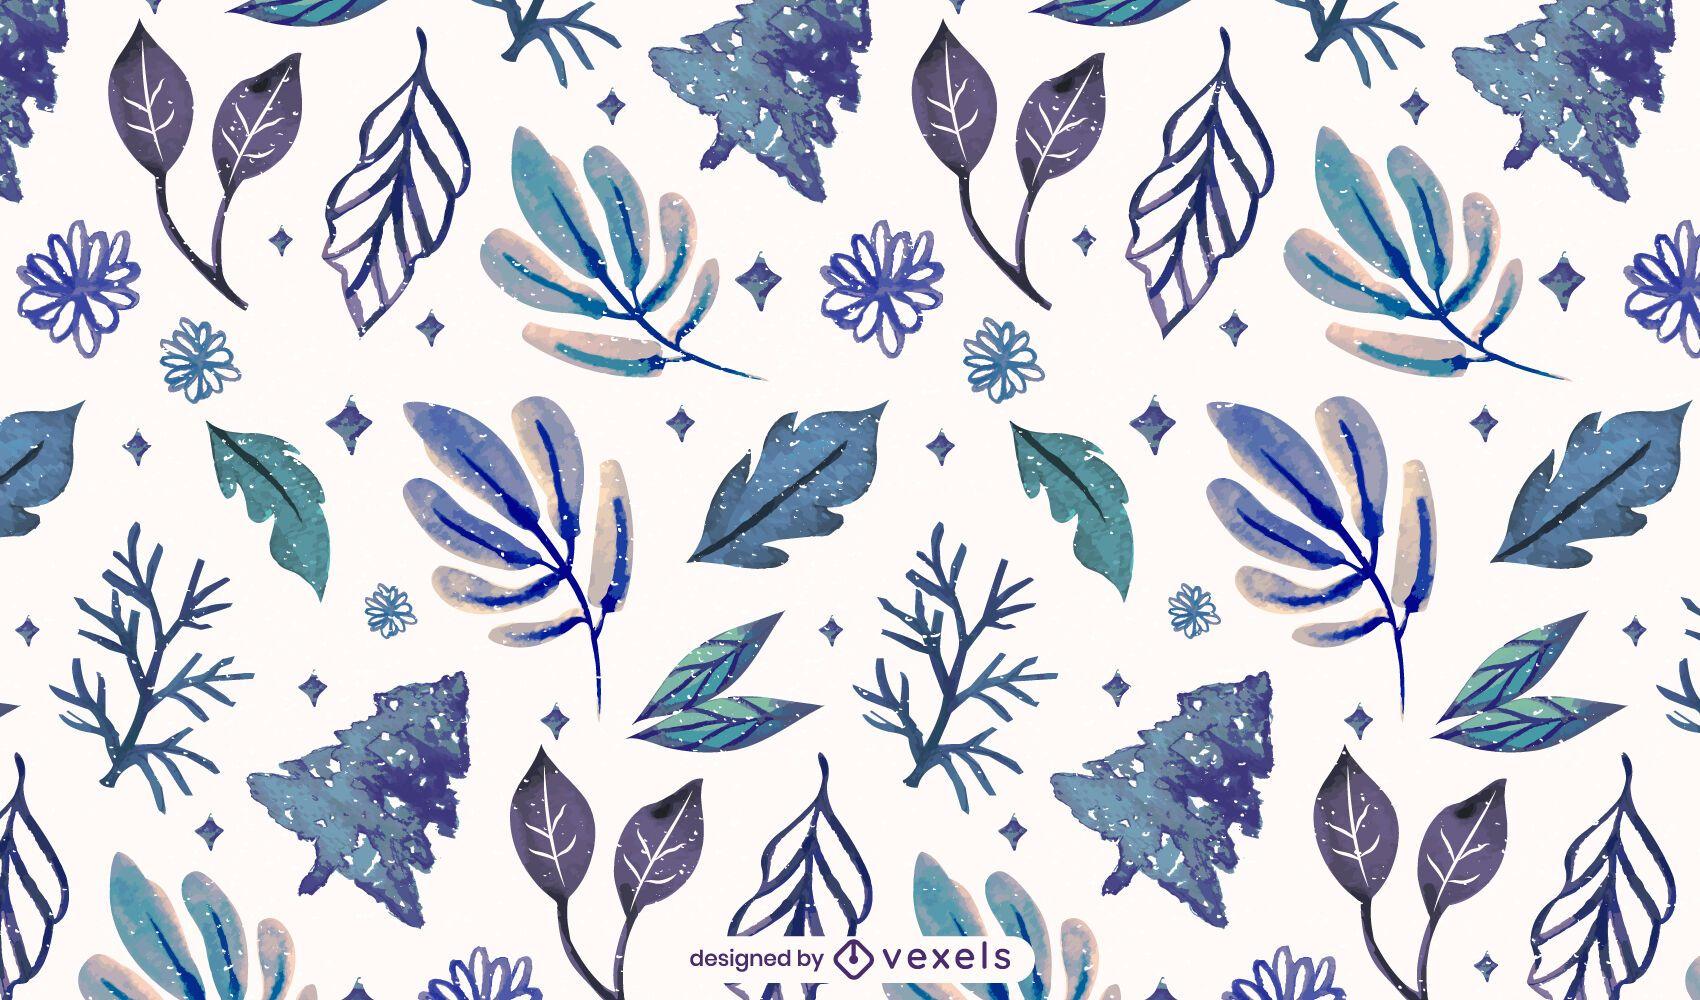 Winter leaves pattern design